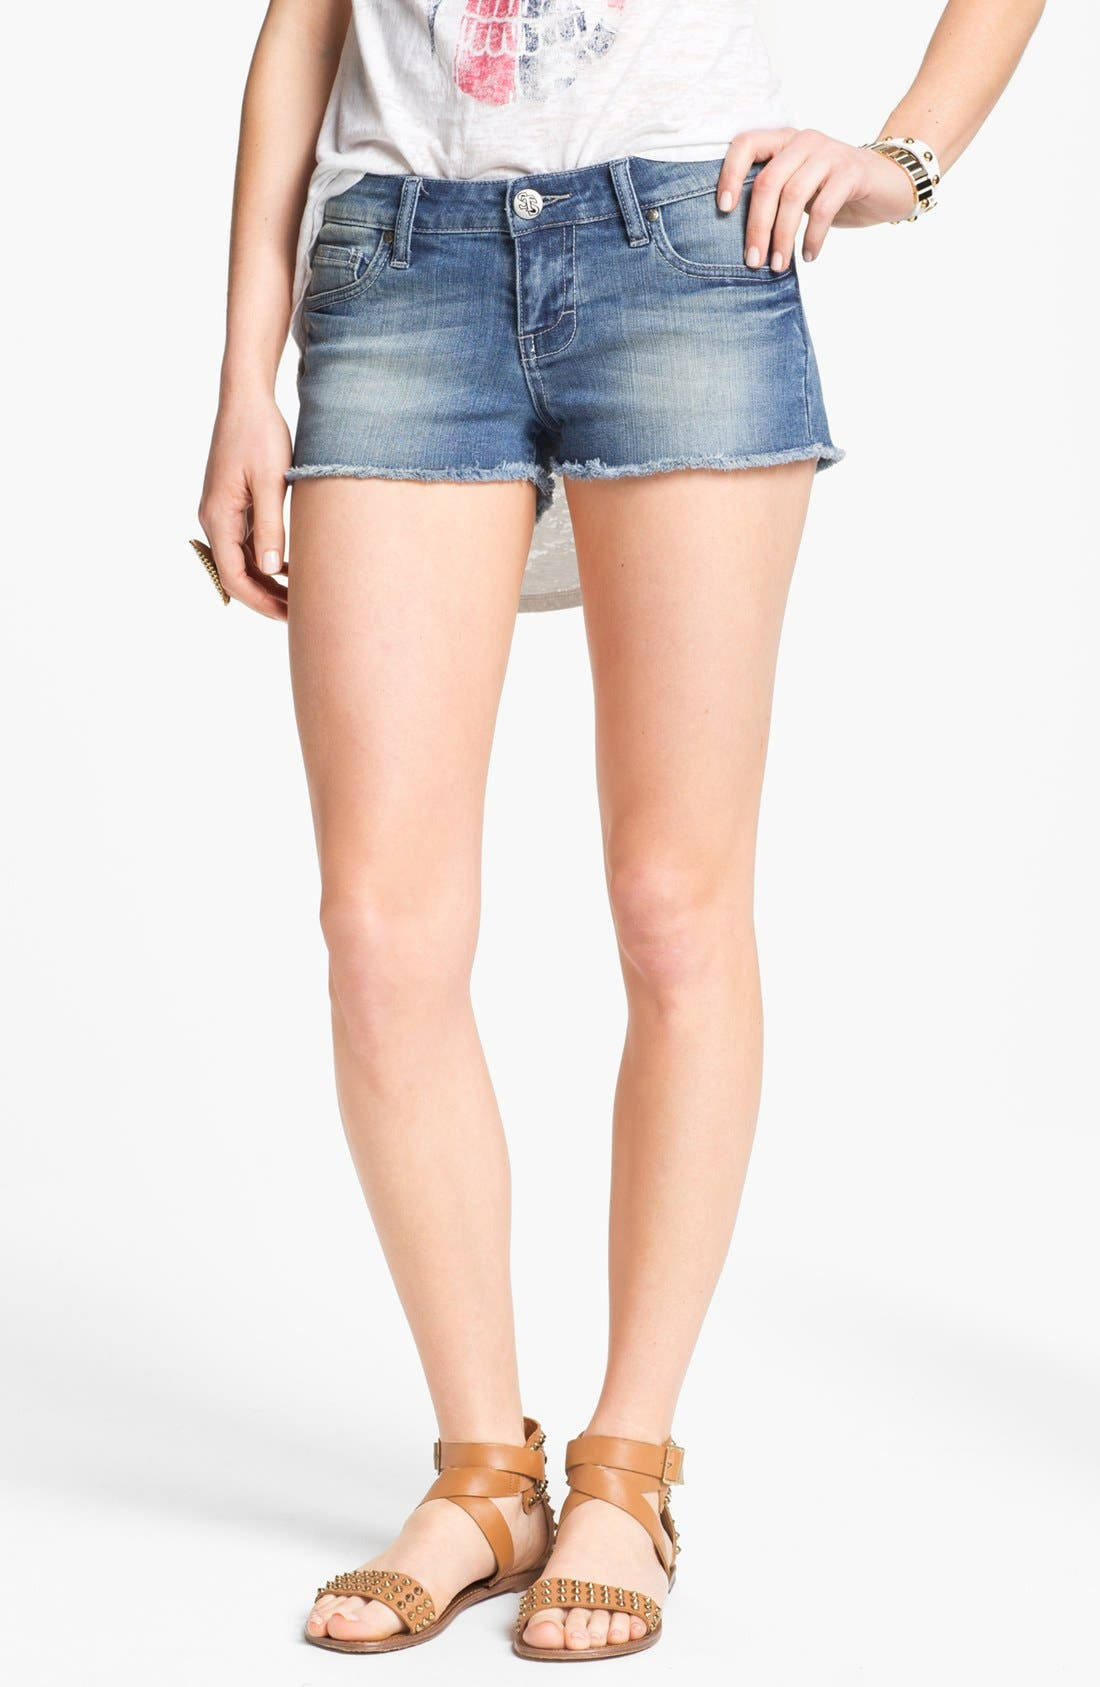 Alternate Image 1 Selected - STS Blue Cutoff Denim Shorts (Agate Medium) (Juniors)